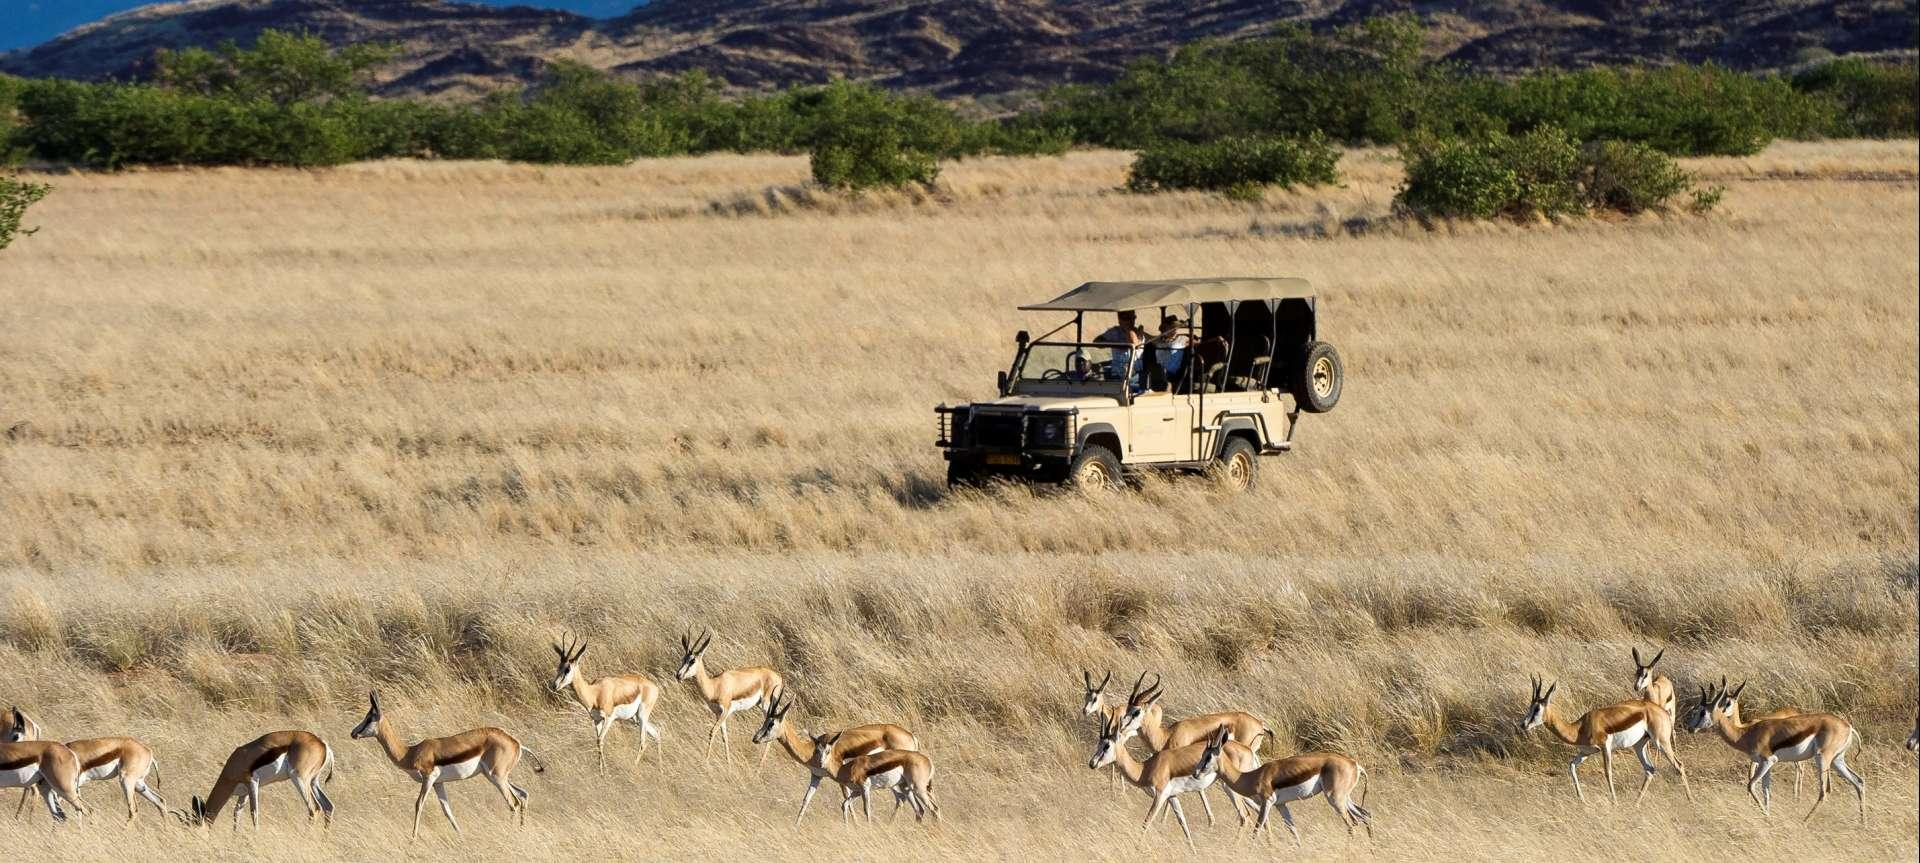 Damaraland - Africa Wildlife Safaris